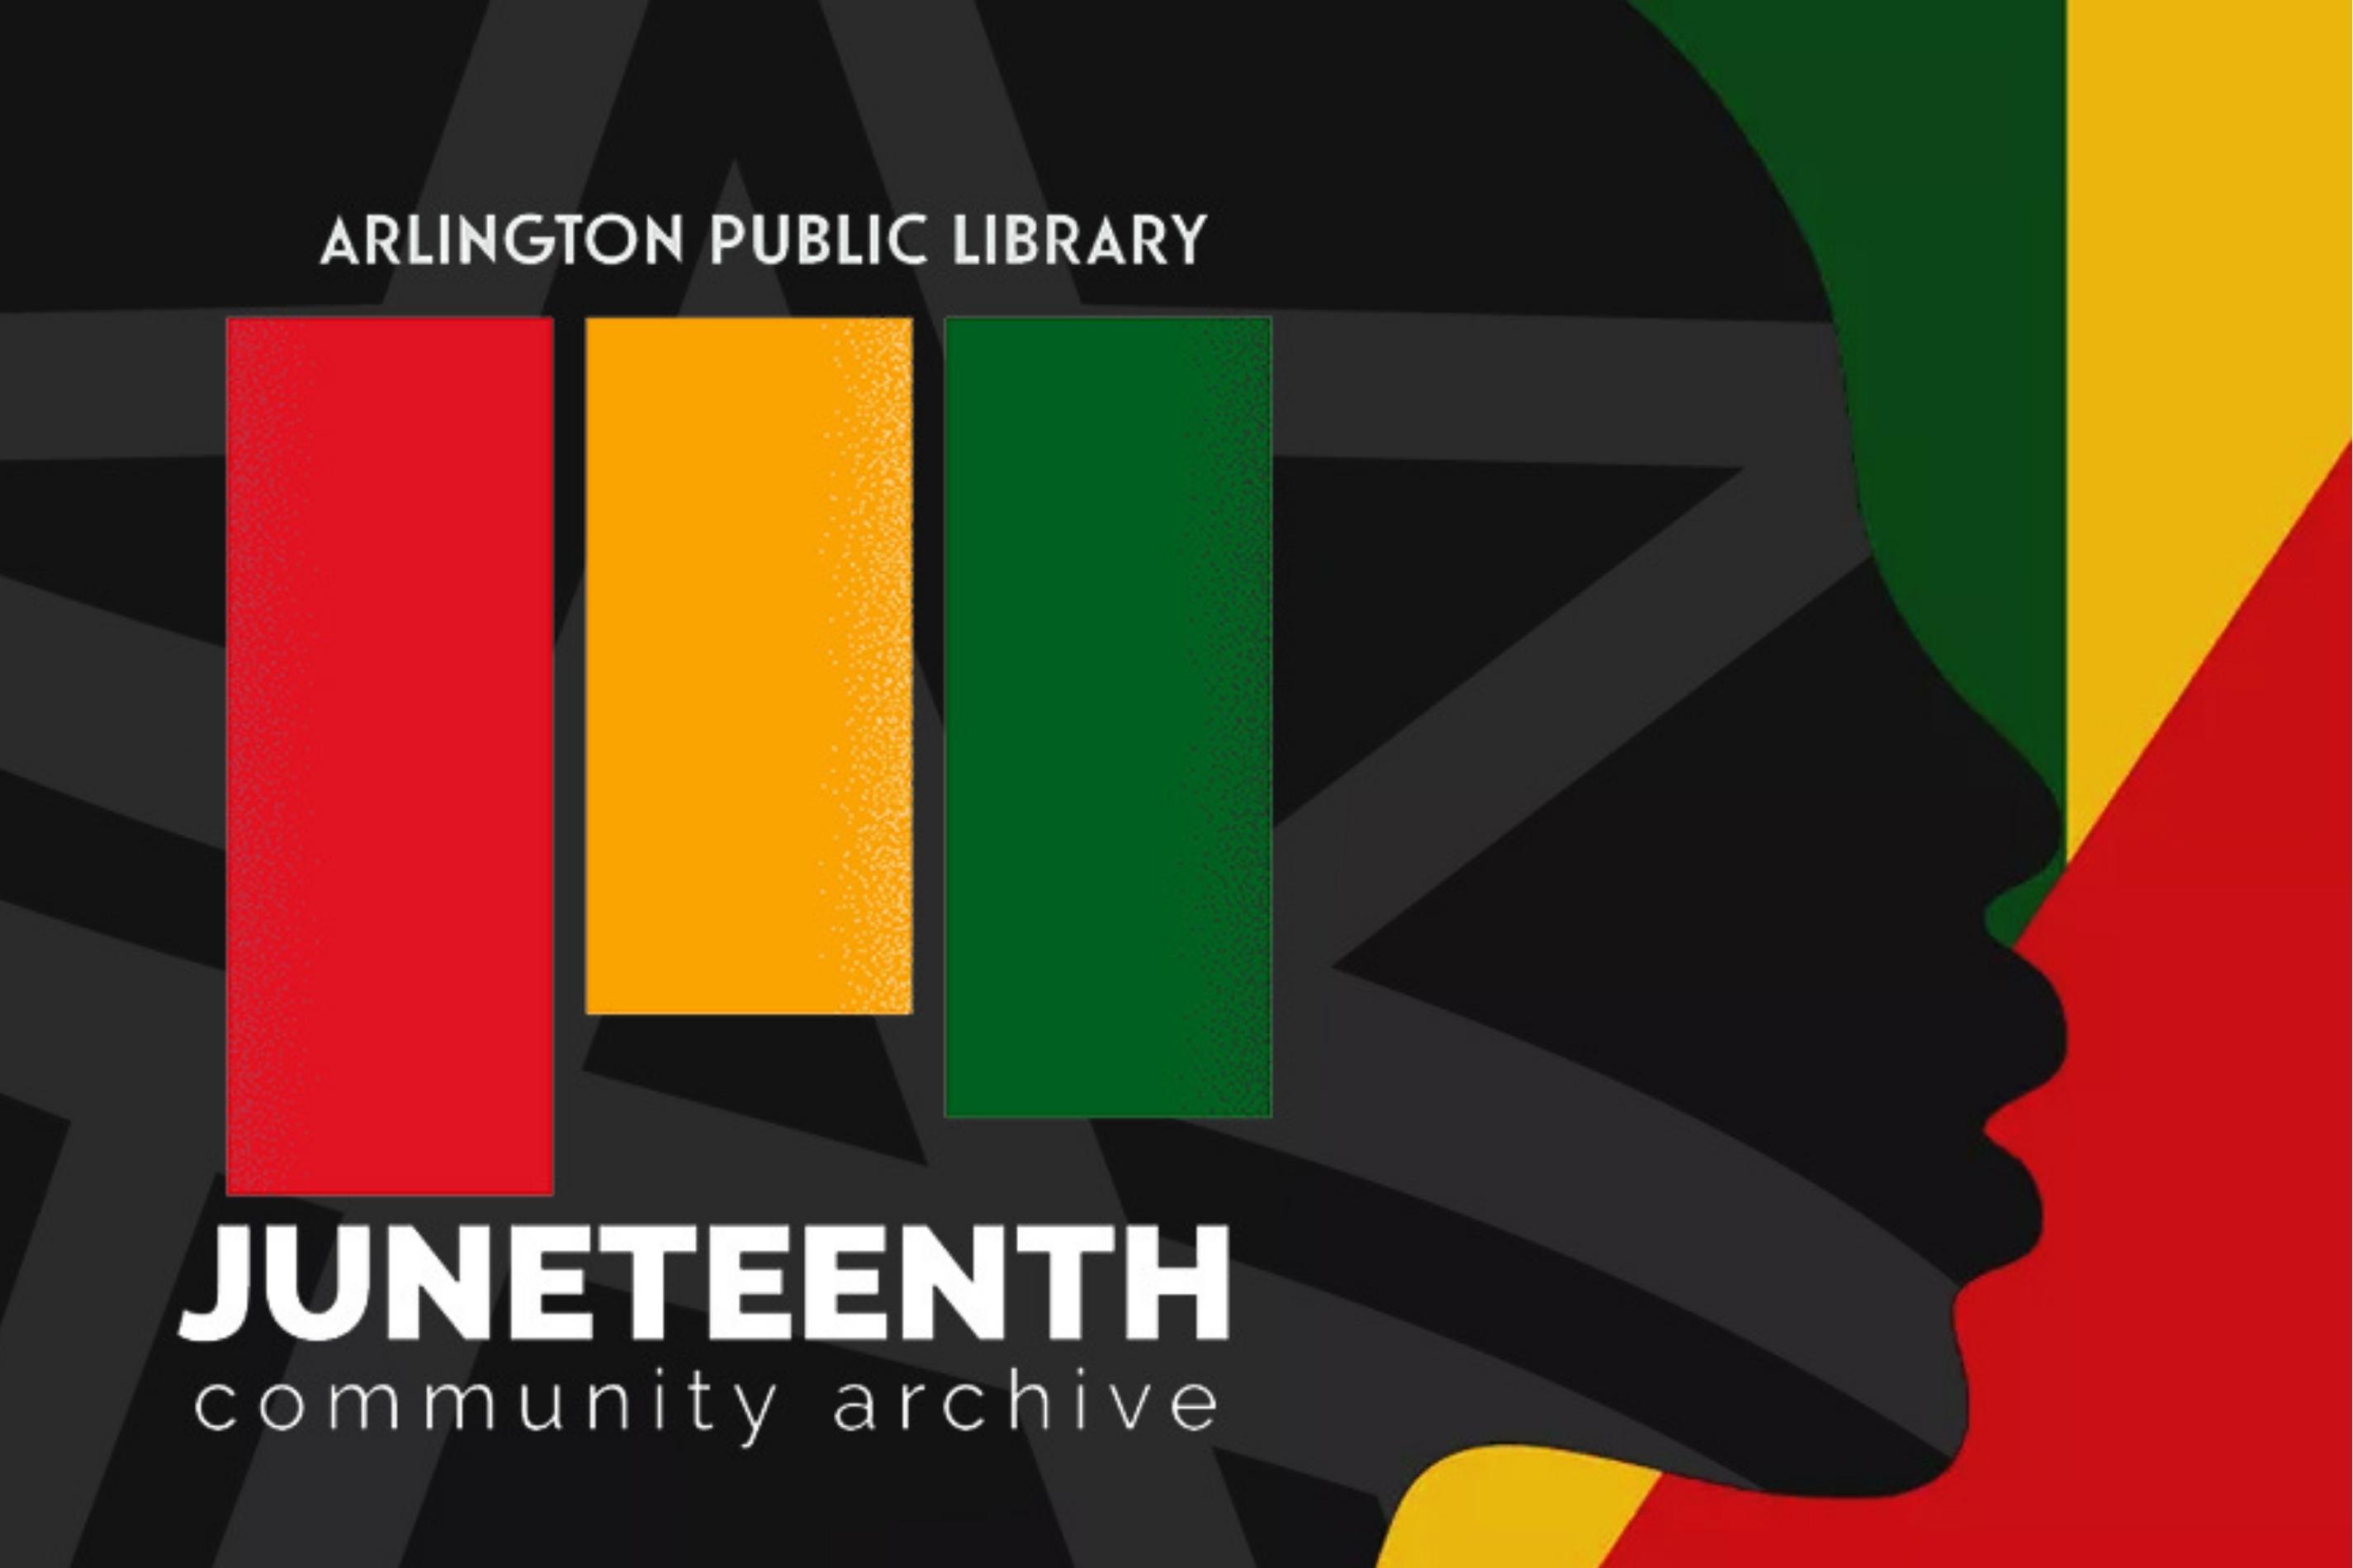 Juneteenth Community Archive Project